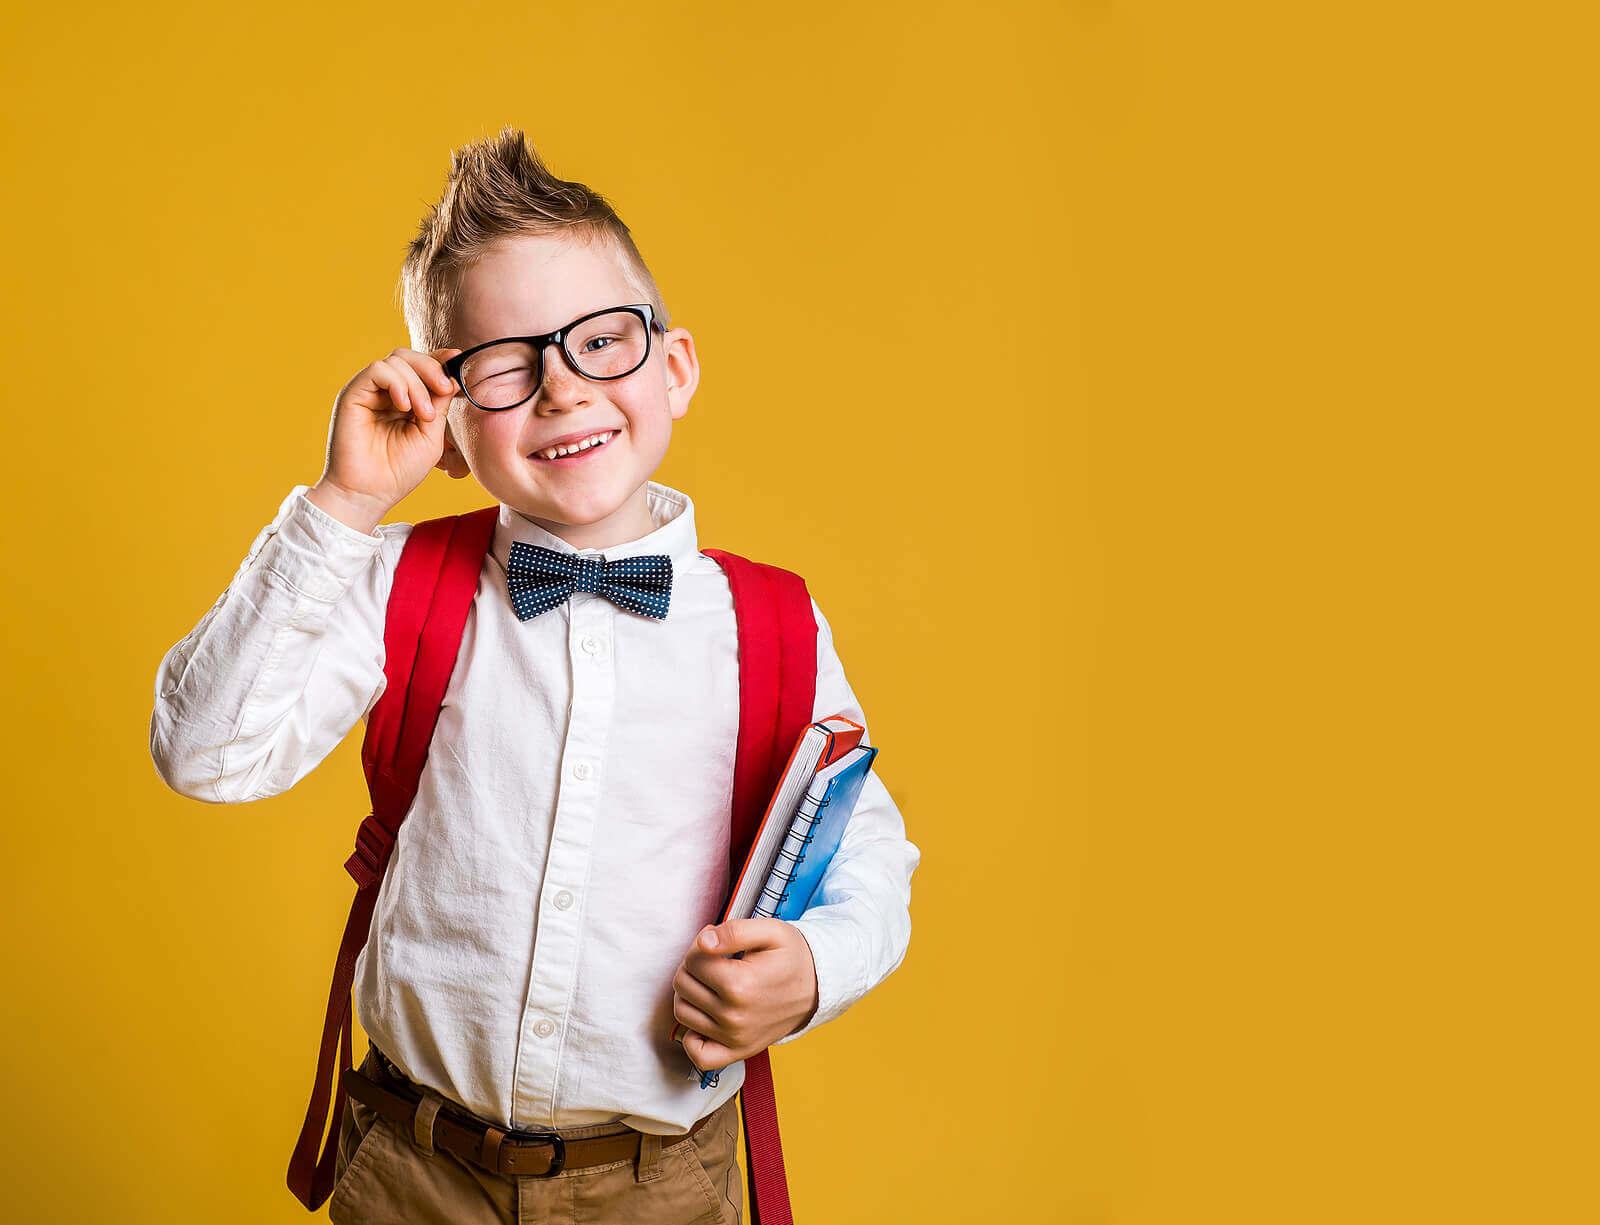 11 Characteristics of Child Geniuses